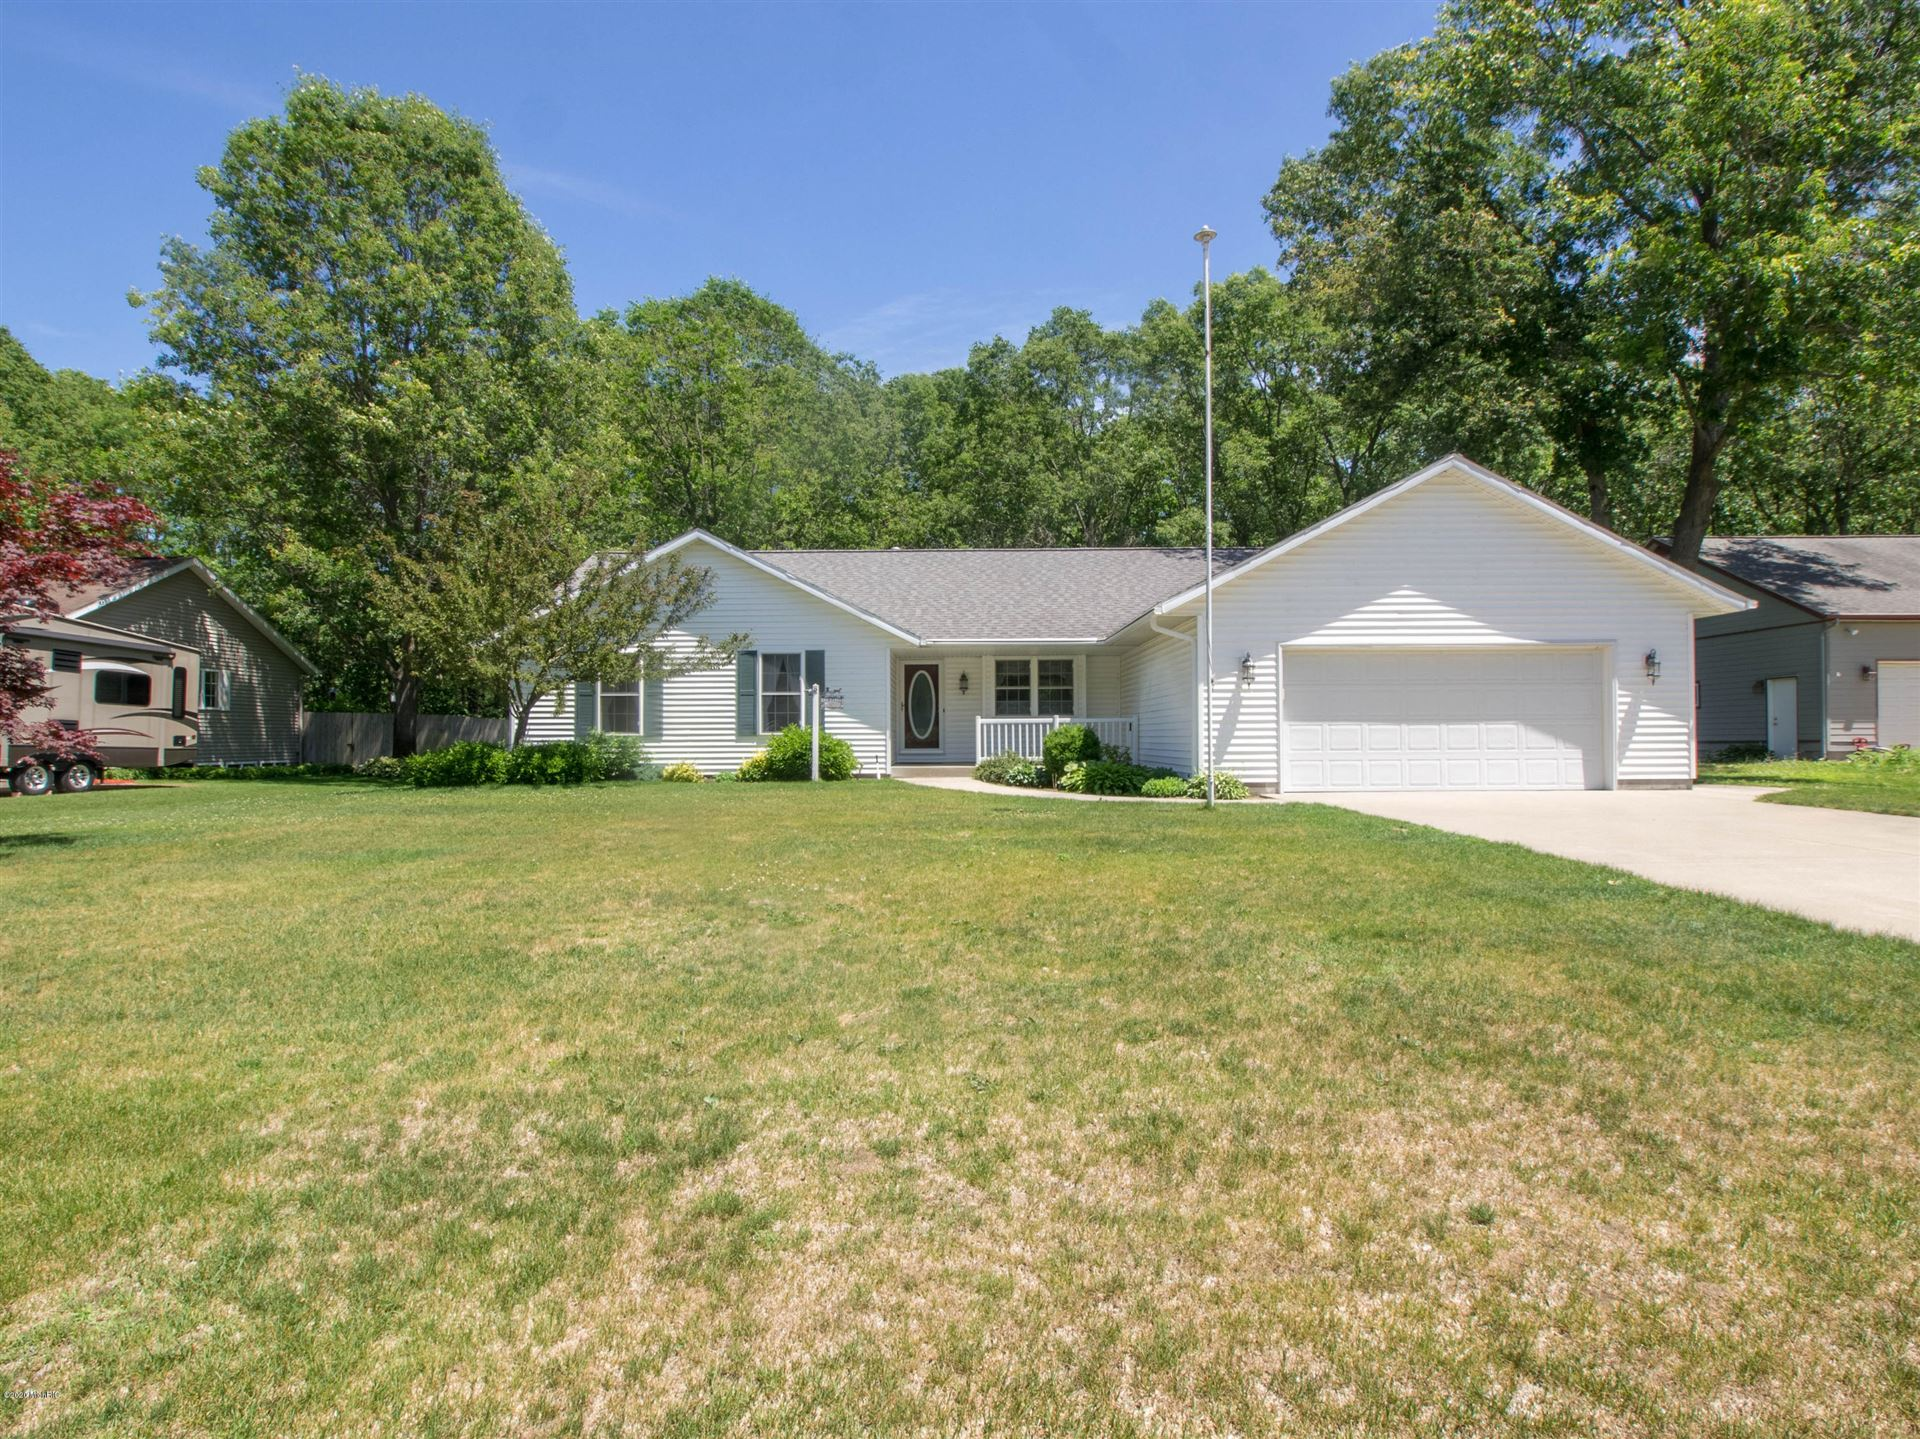 Photo of 1530 Wildwood Drive, Muskegon, MI 49445 (MLS # 20023416)